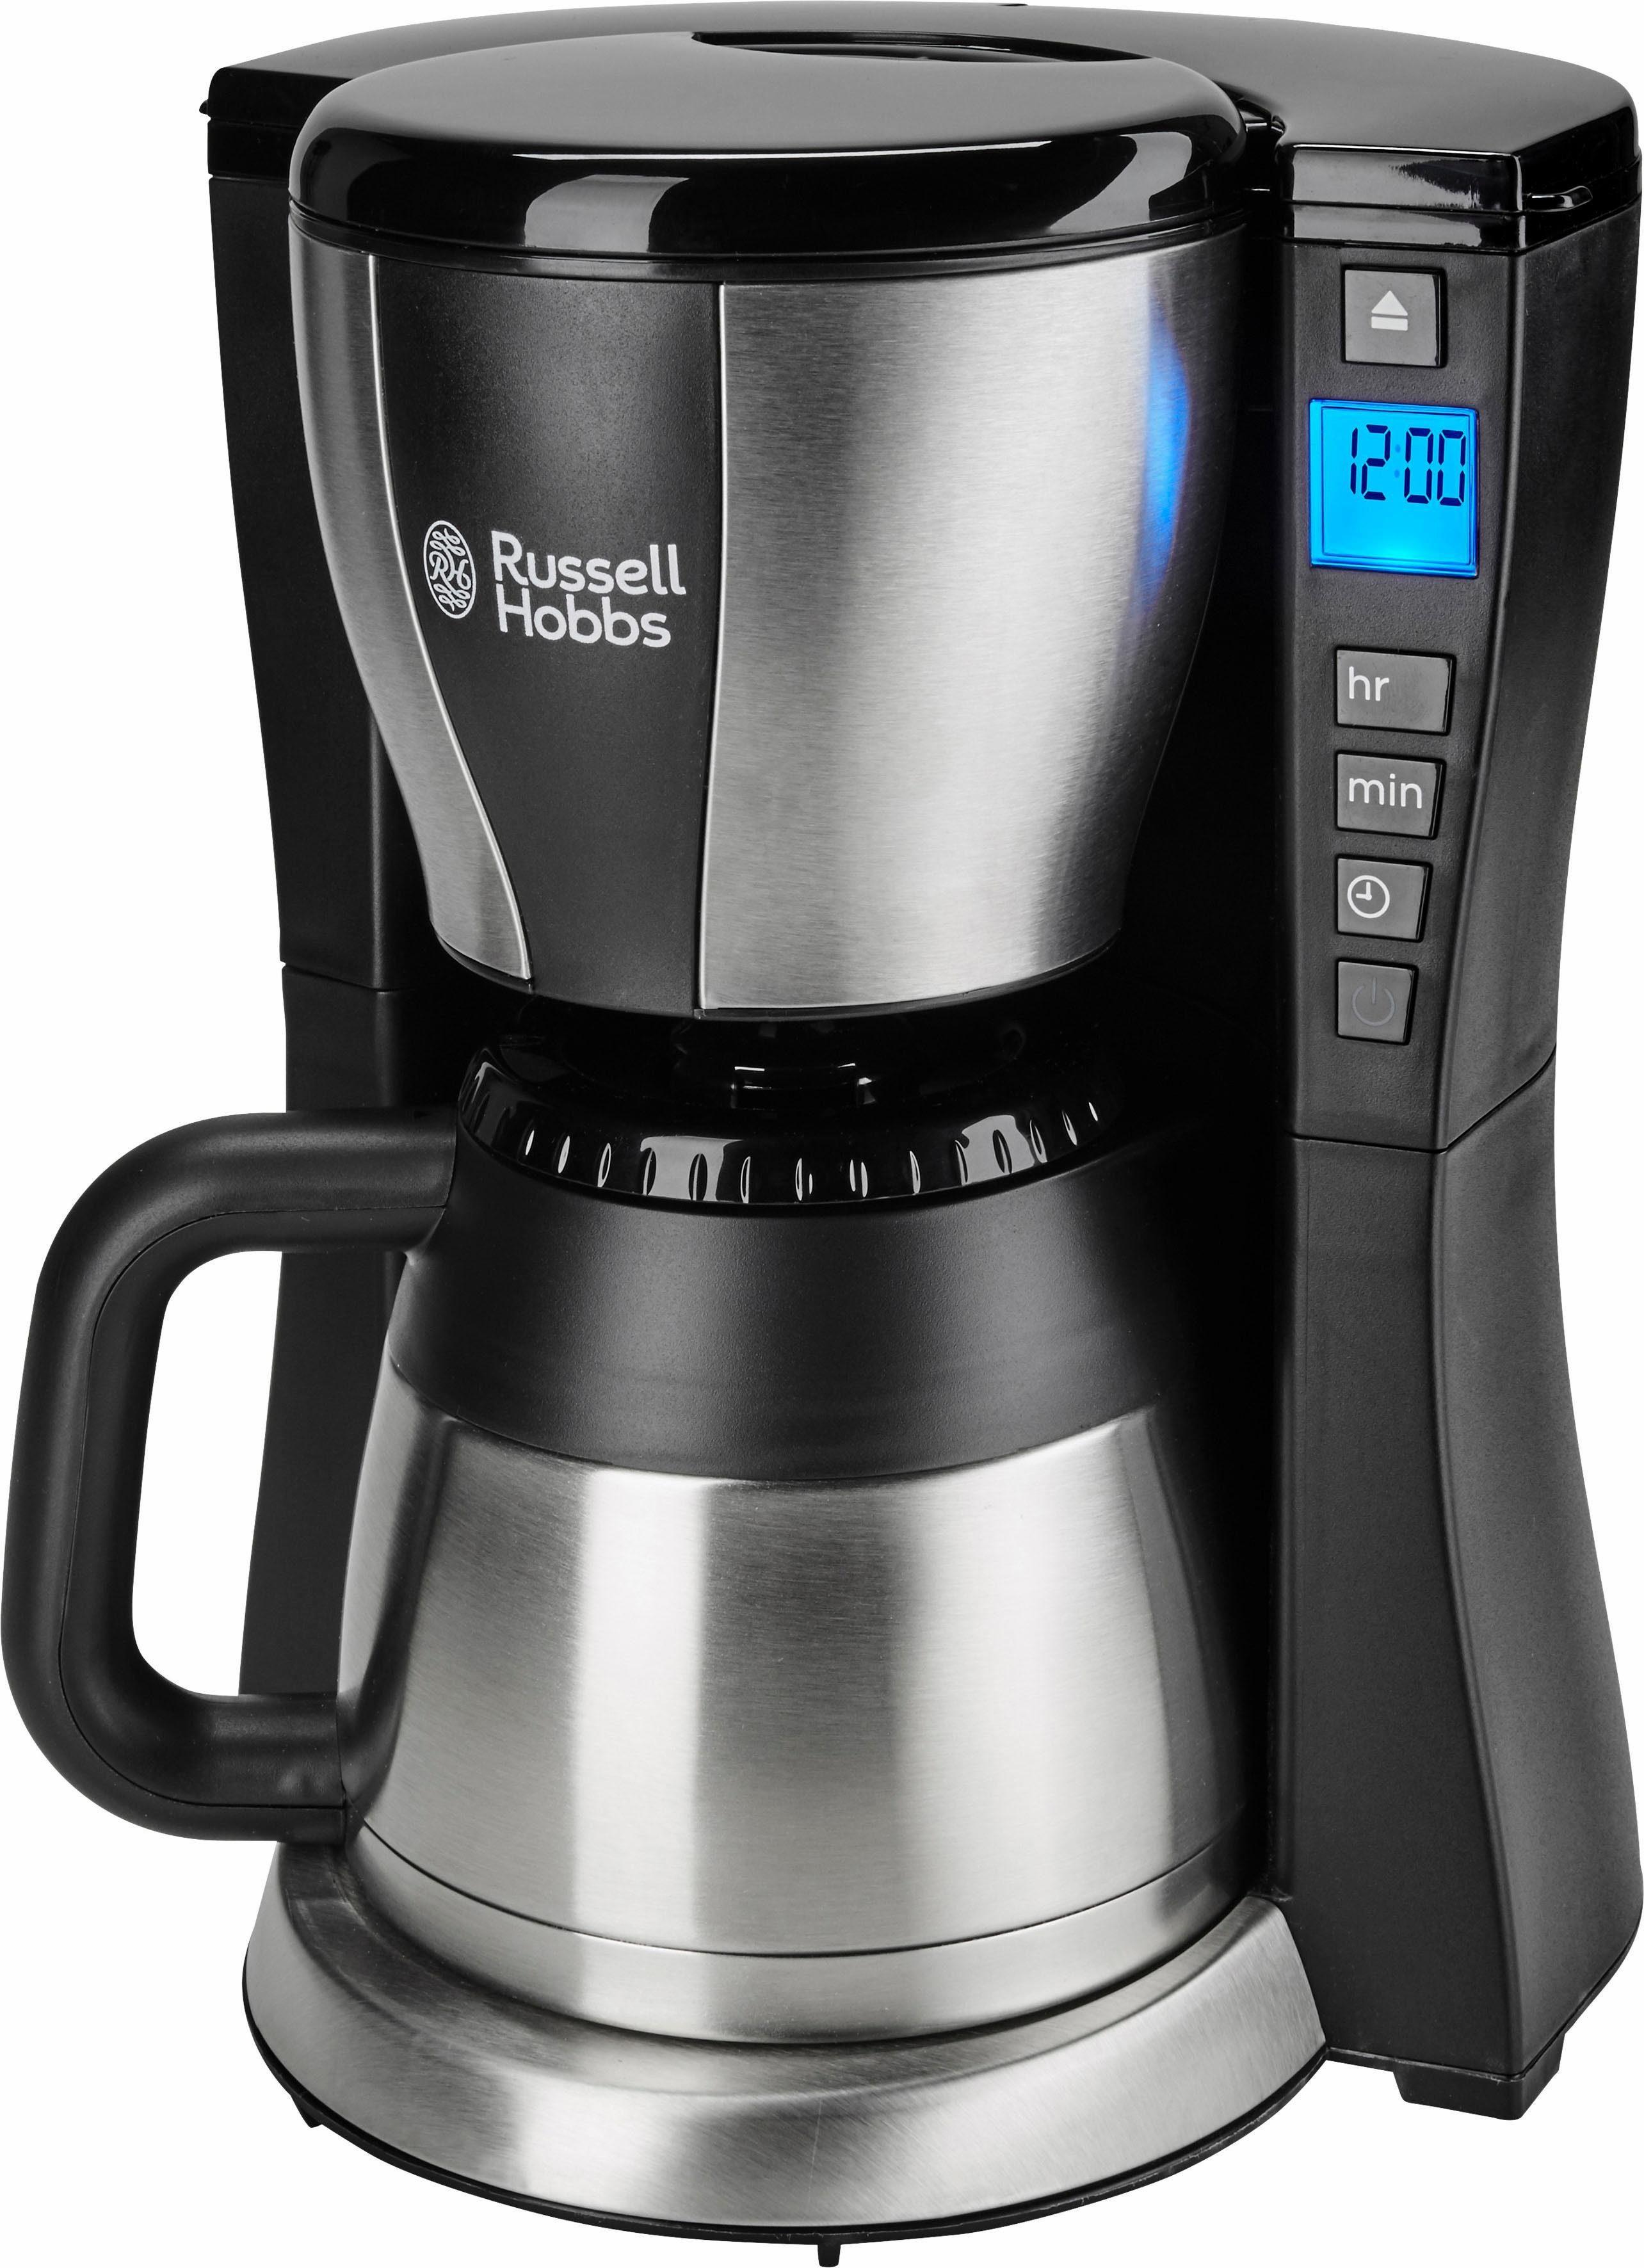 RUSSELL HOBBS Filterkaffeemaschine Fast Brew 23750-56, 1l Kaffeekanne, 1x4, mit Thermokanne, 1200 Watt, Edelstahl-schwarz